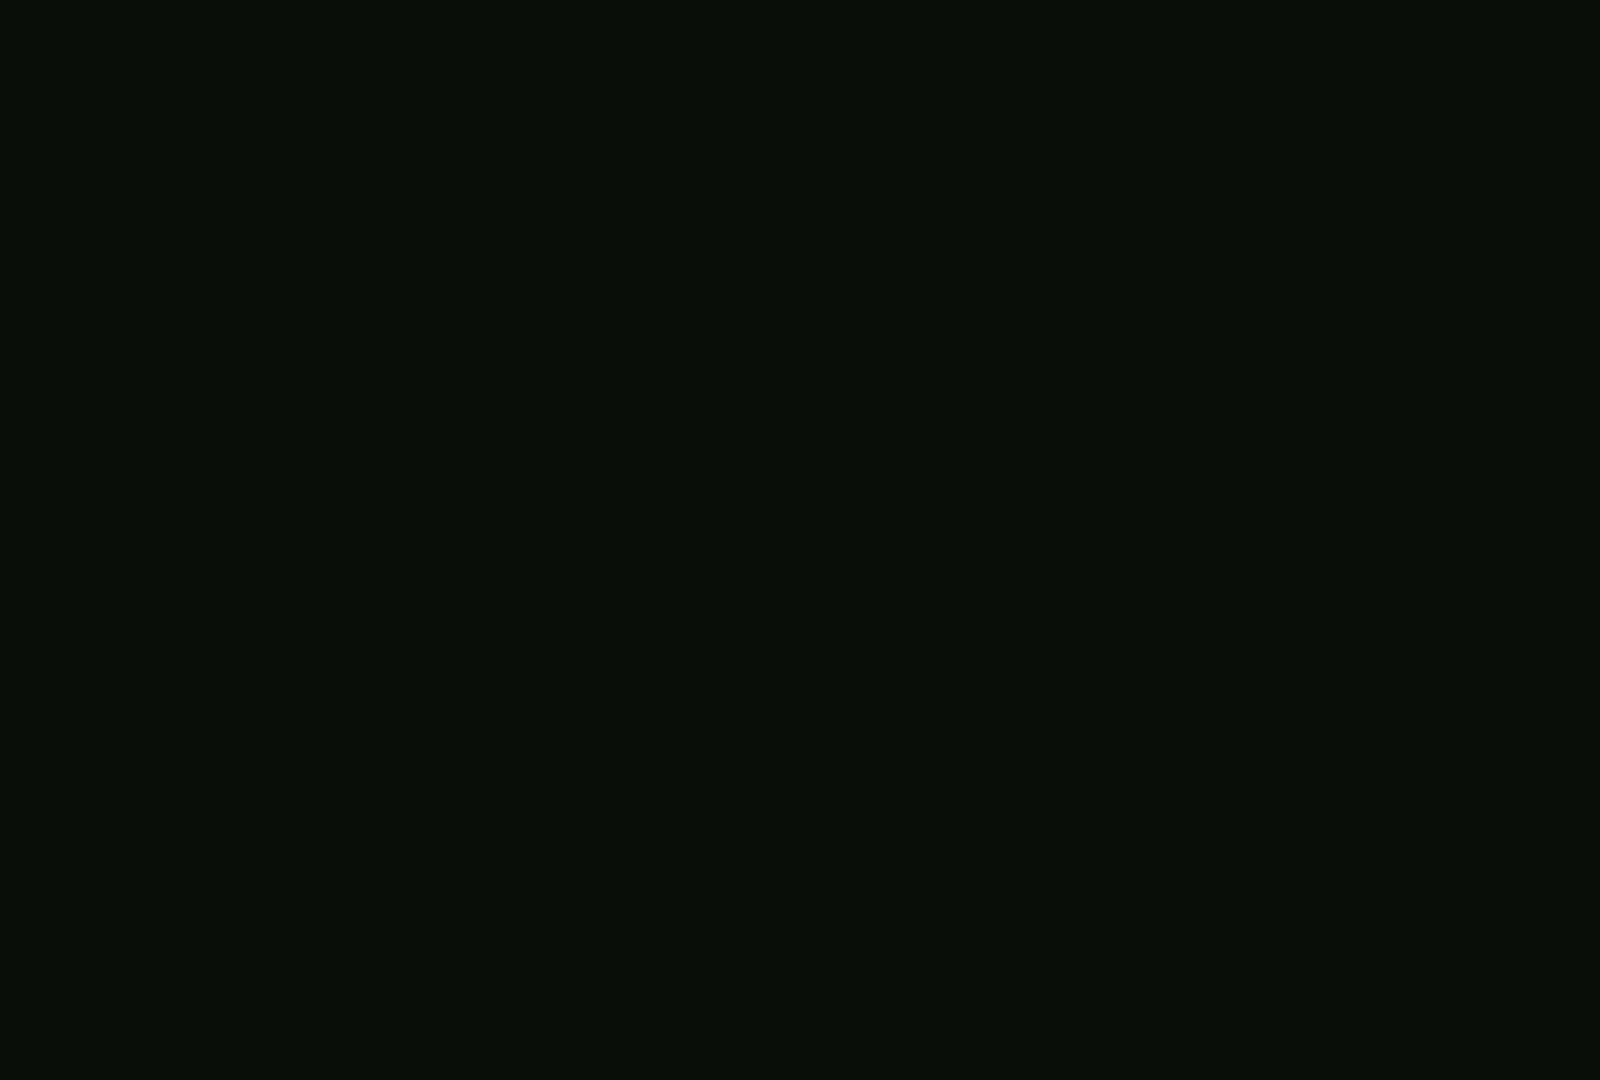 充血監督の深夜の運動会Vol.92 野外 性交動画流出 97pic 23